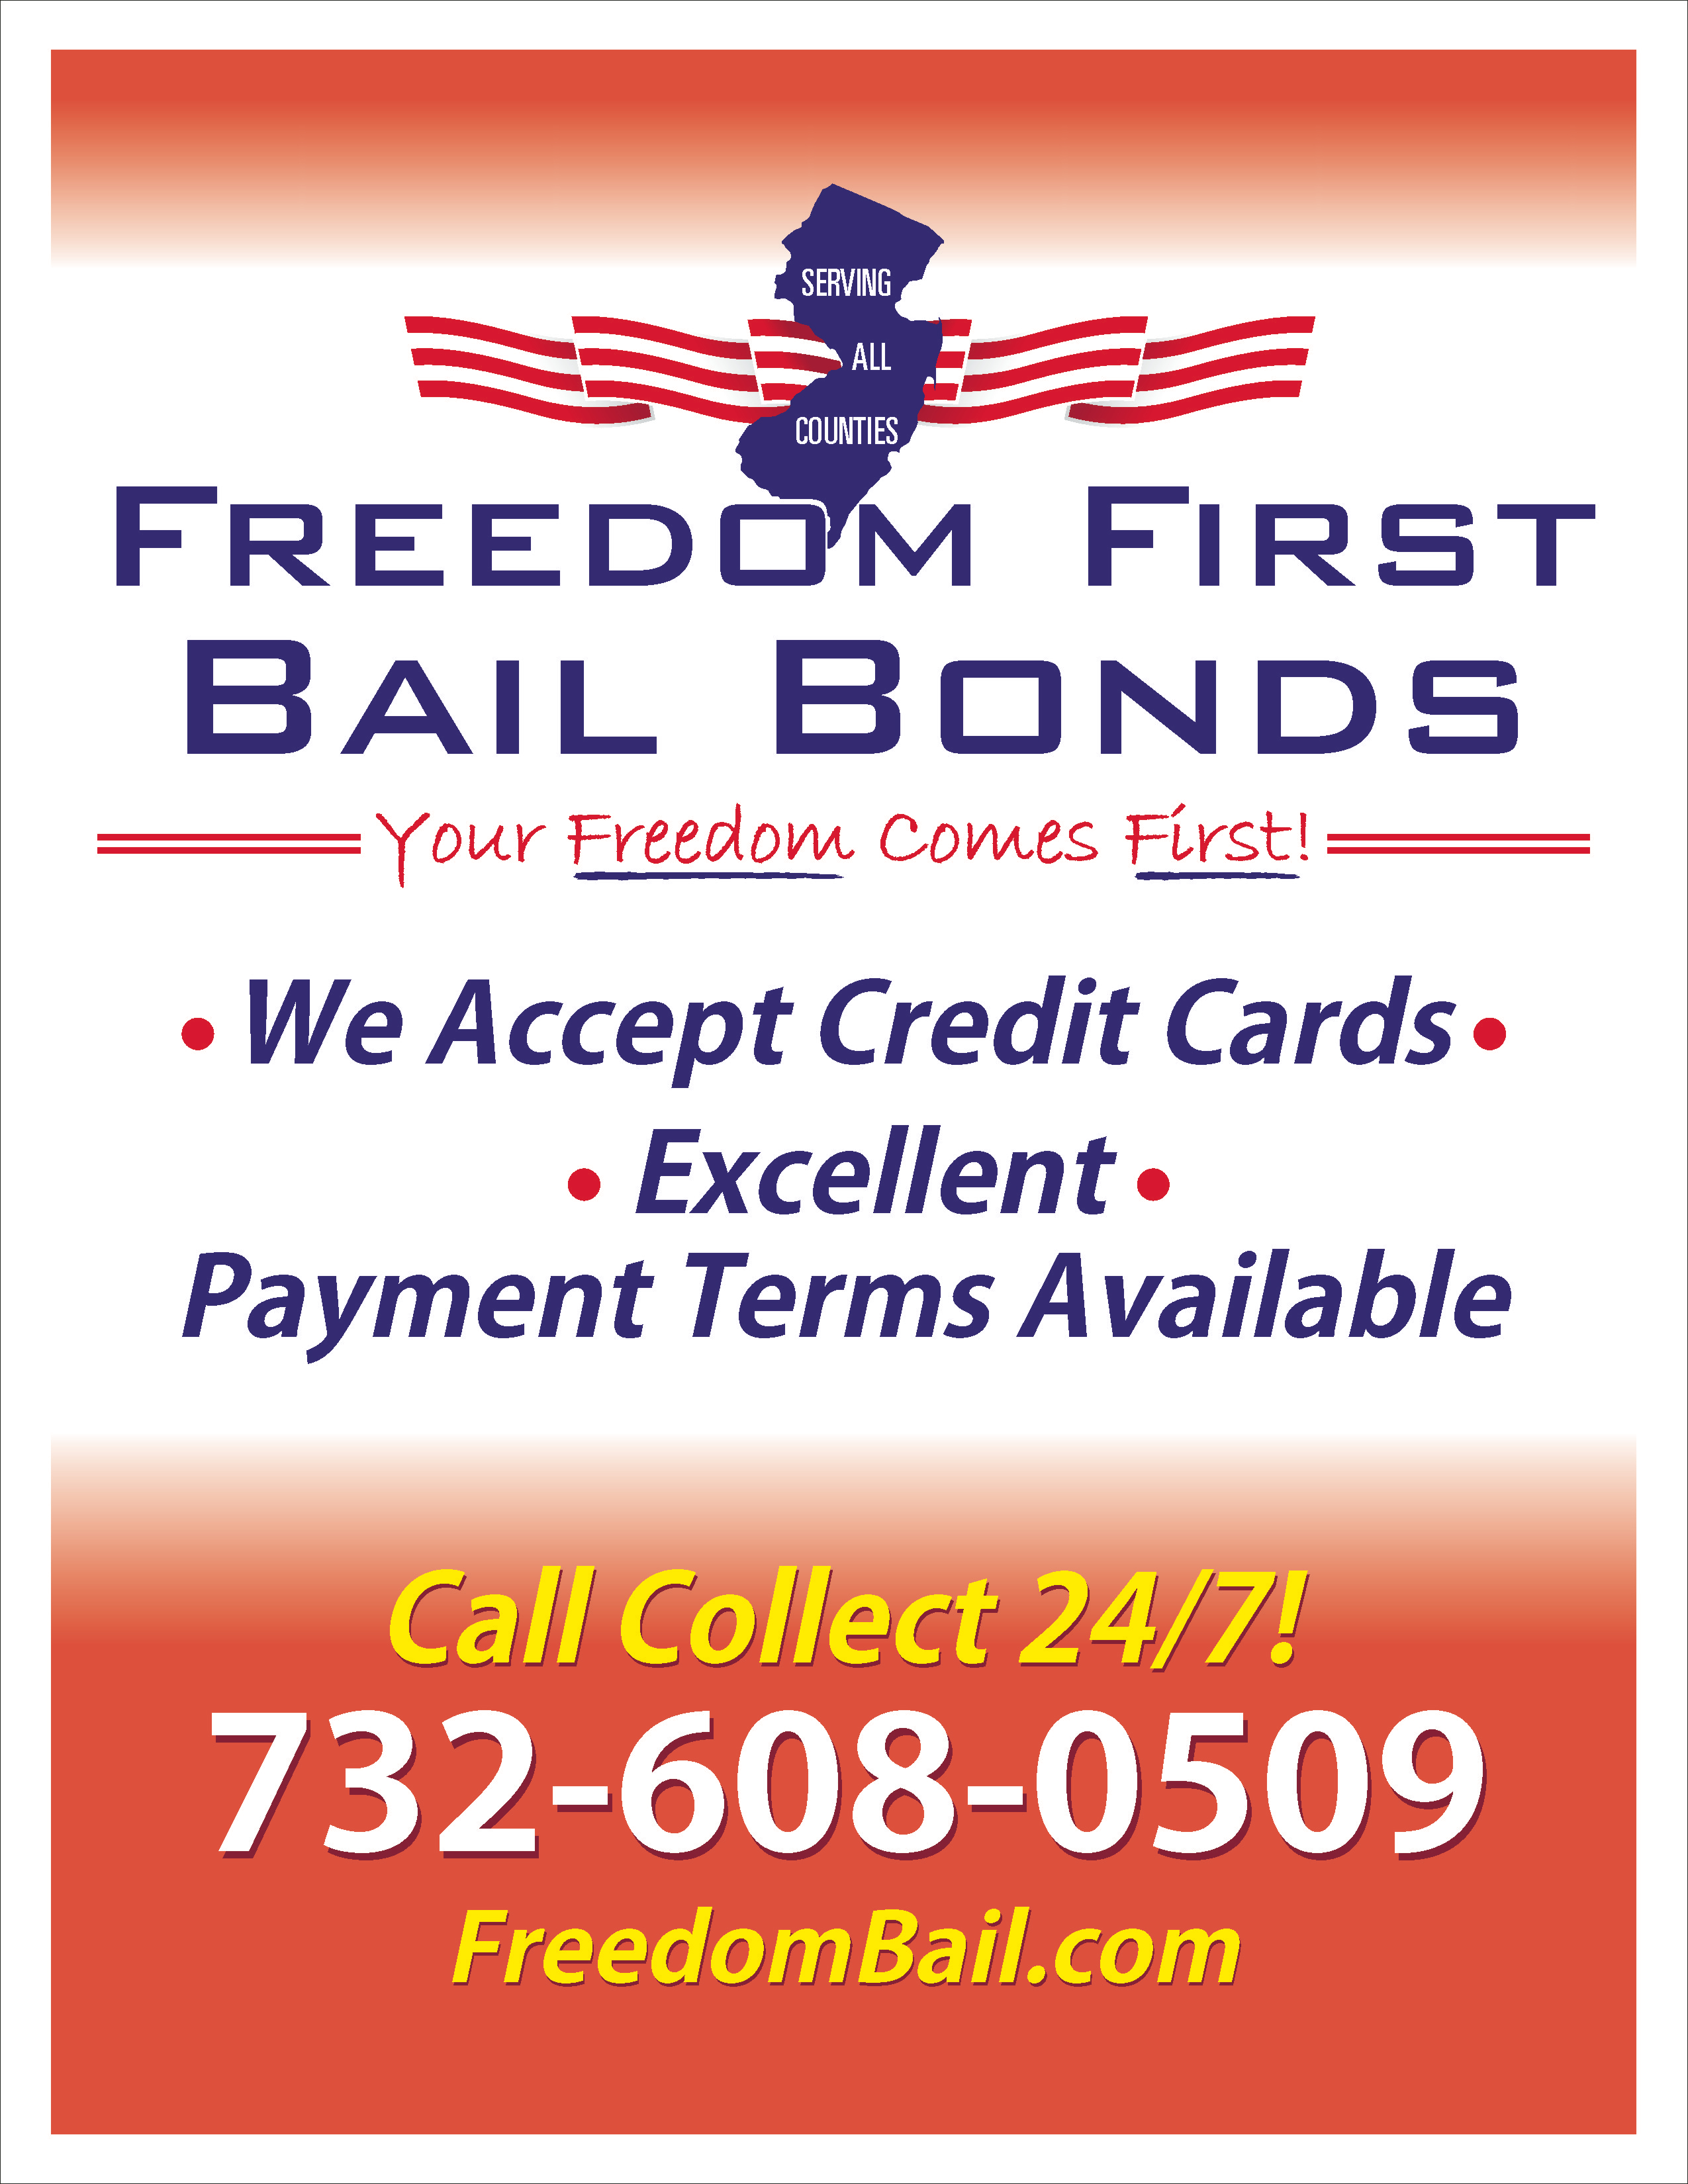 Freedom First Bail Bonds